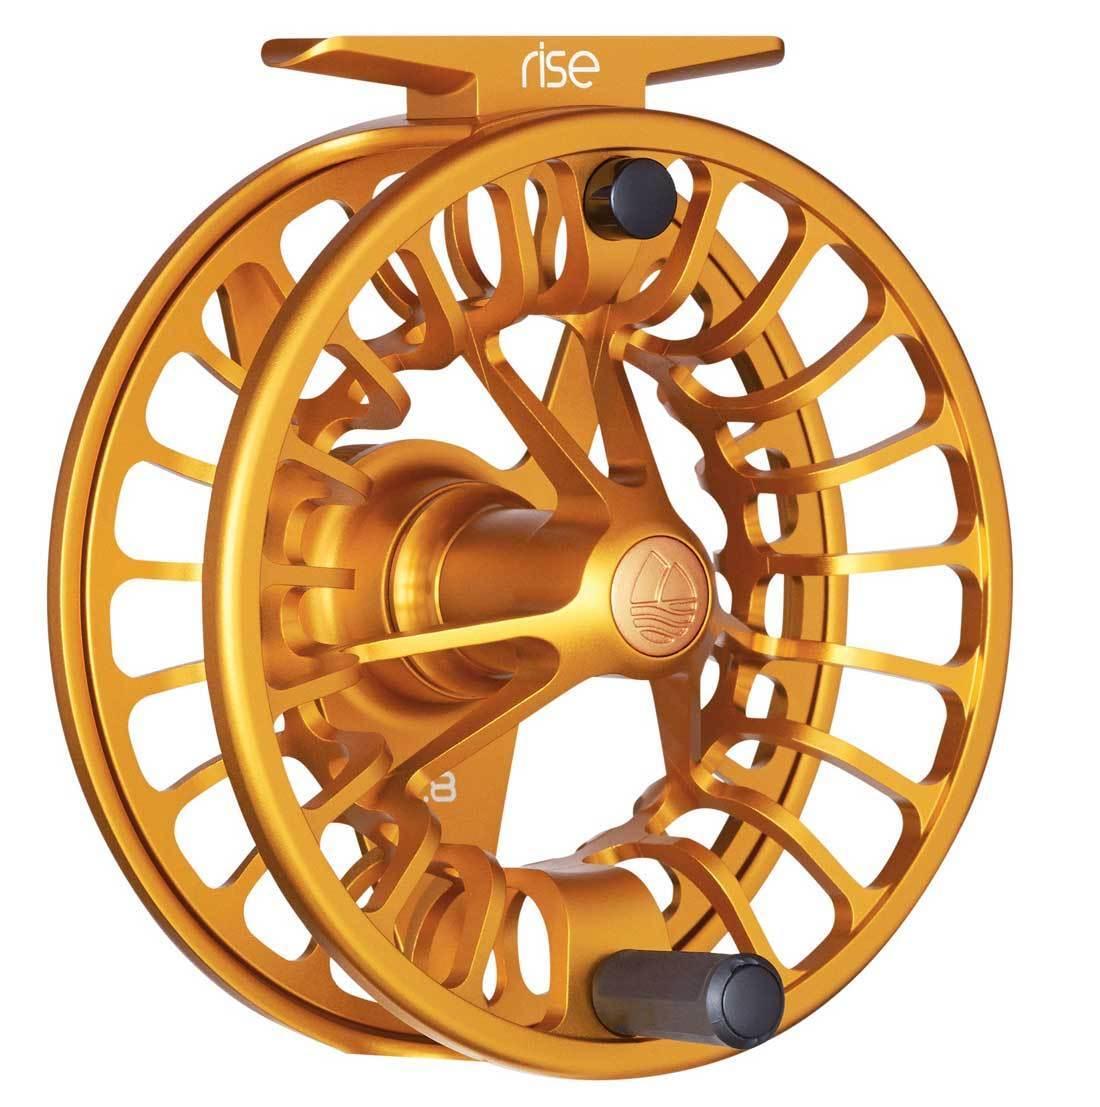 Redington Rise 5 6 Fly Fishing Reel - Amber - NIB w  warranty - Free US Shipping